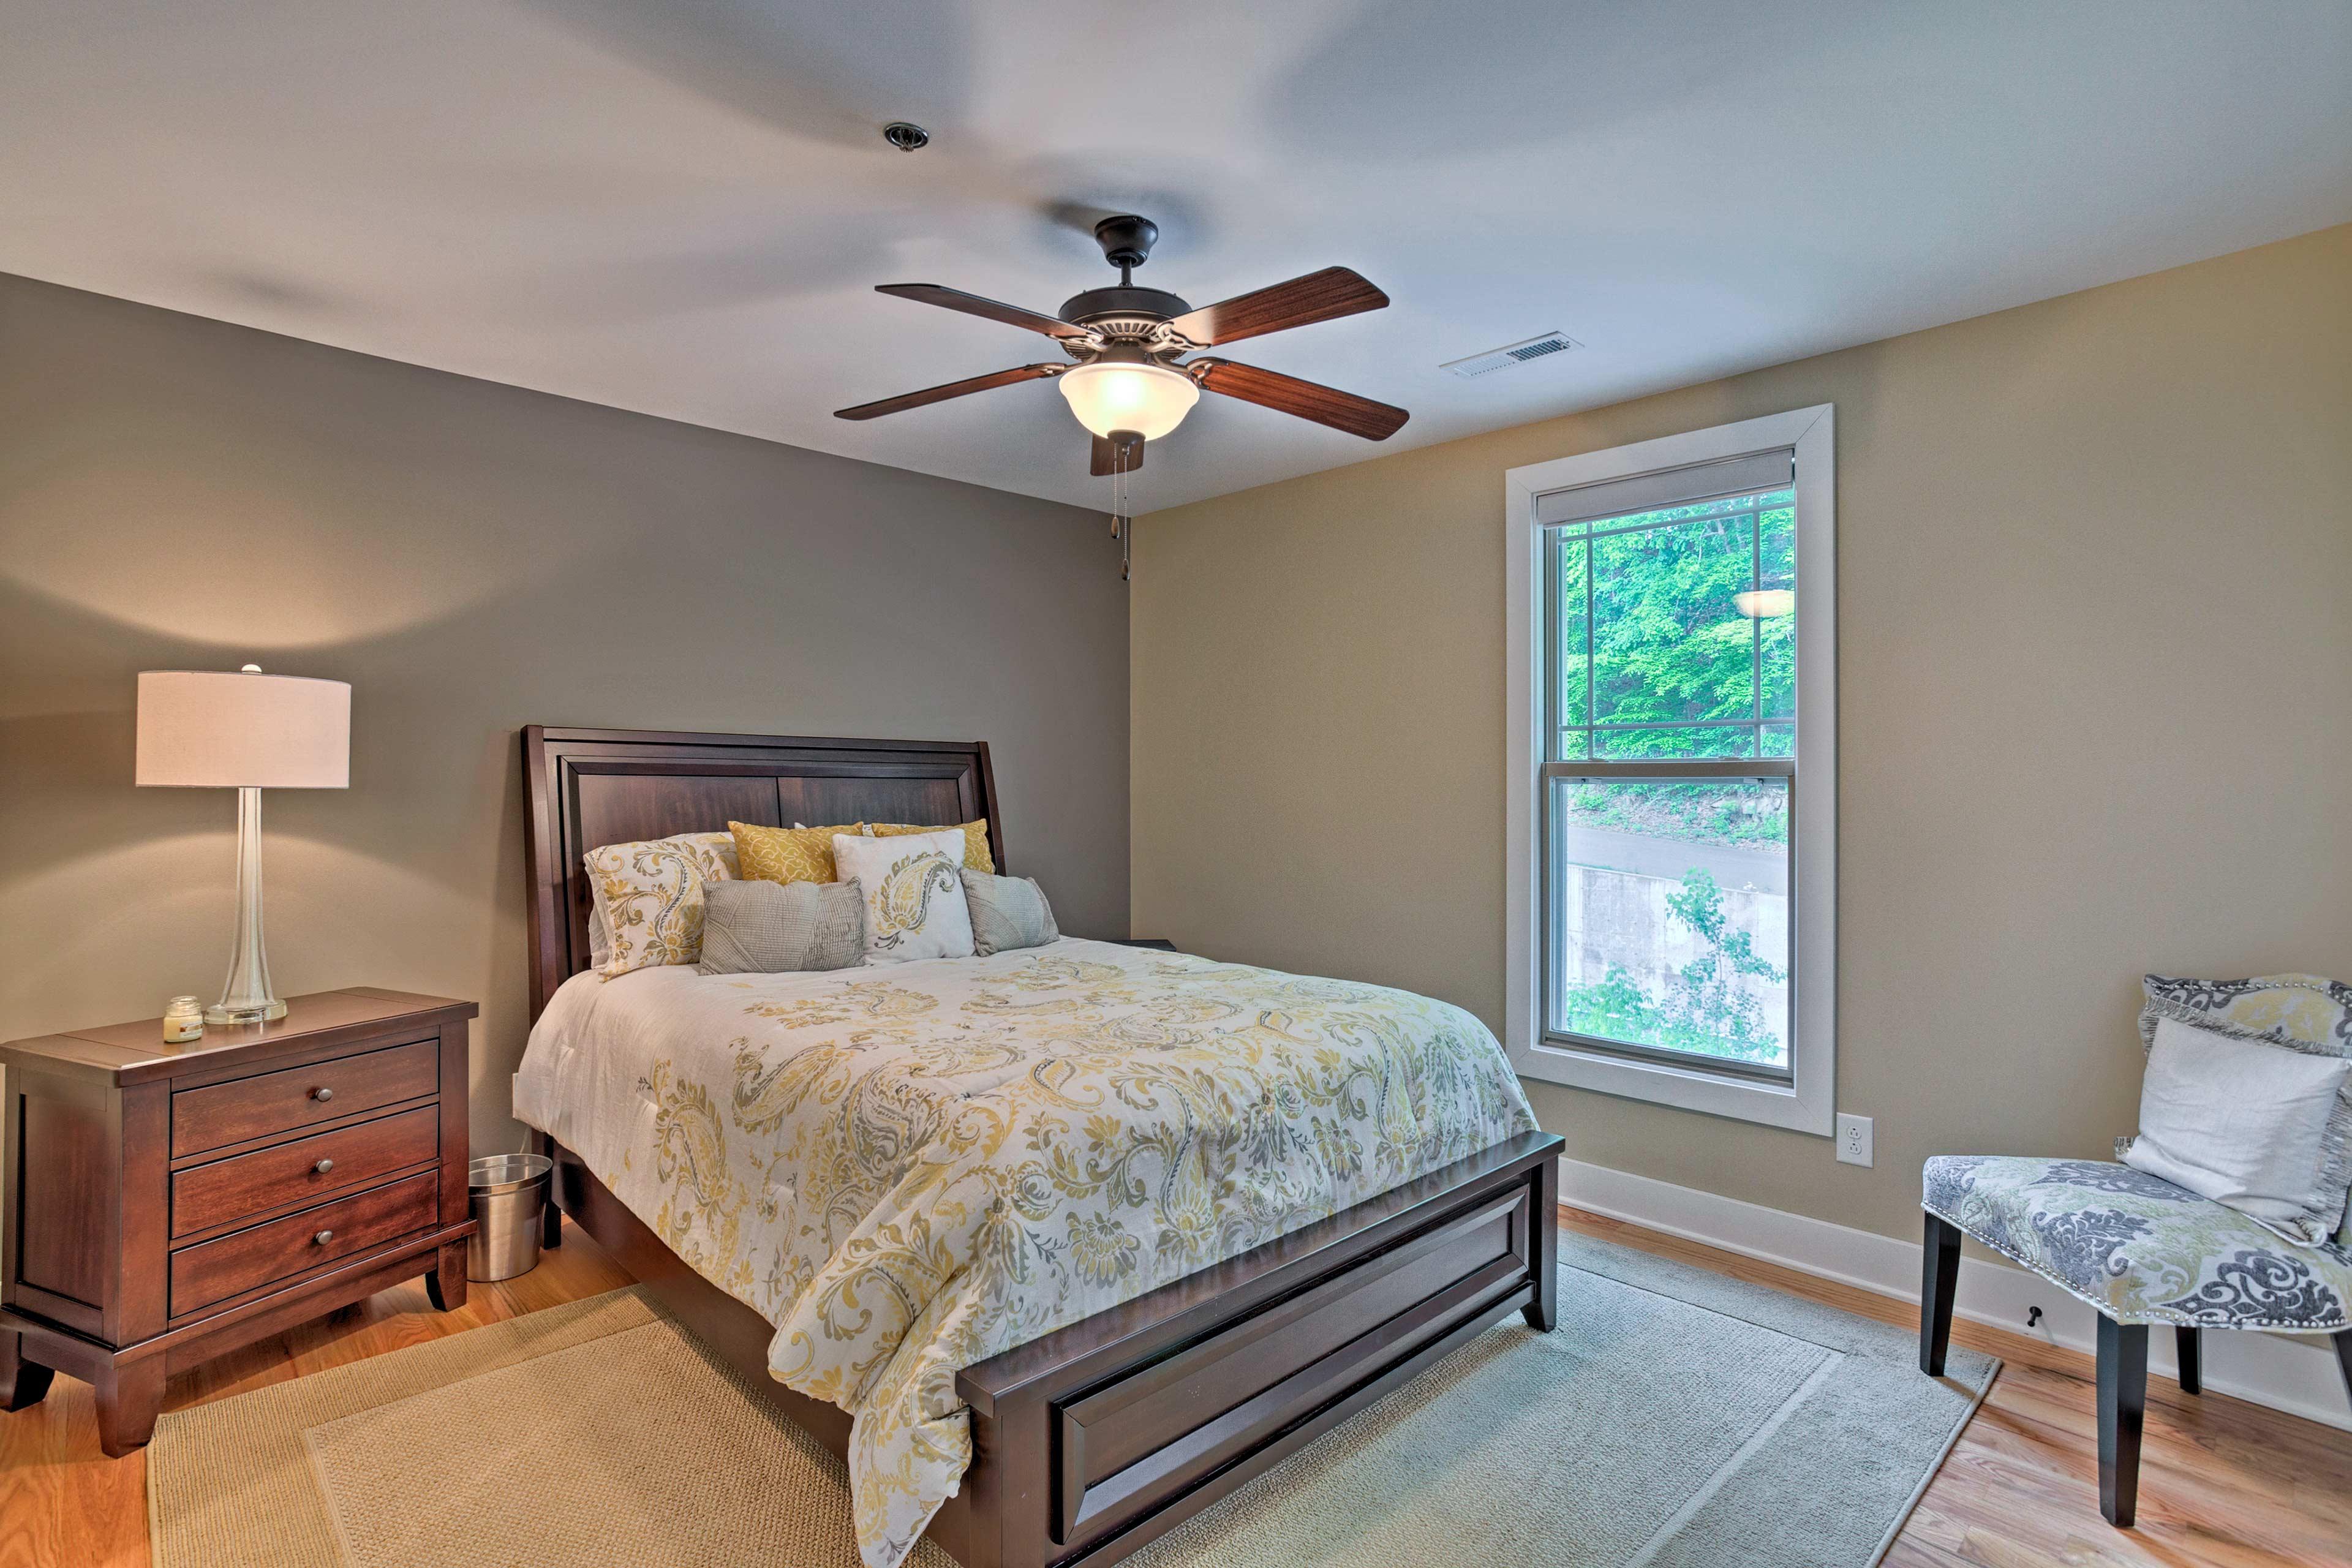 Each spacious bedroom includes wood furnishings.